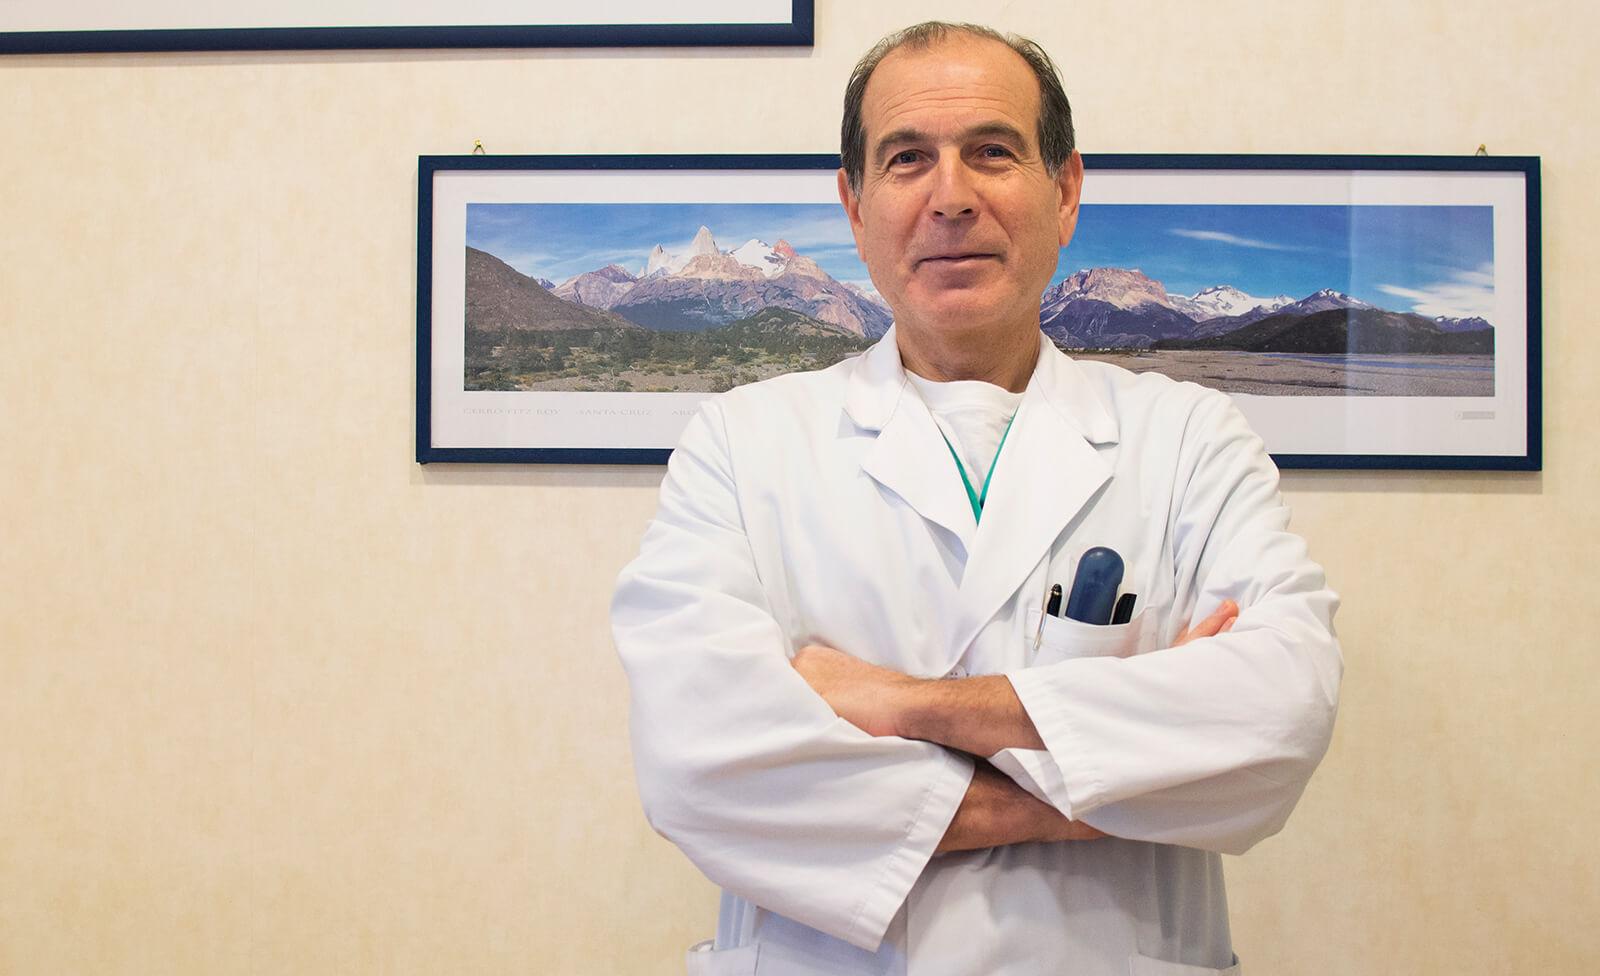 chirurgo protesi anca